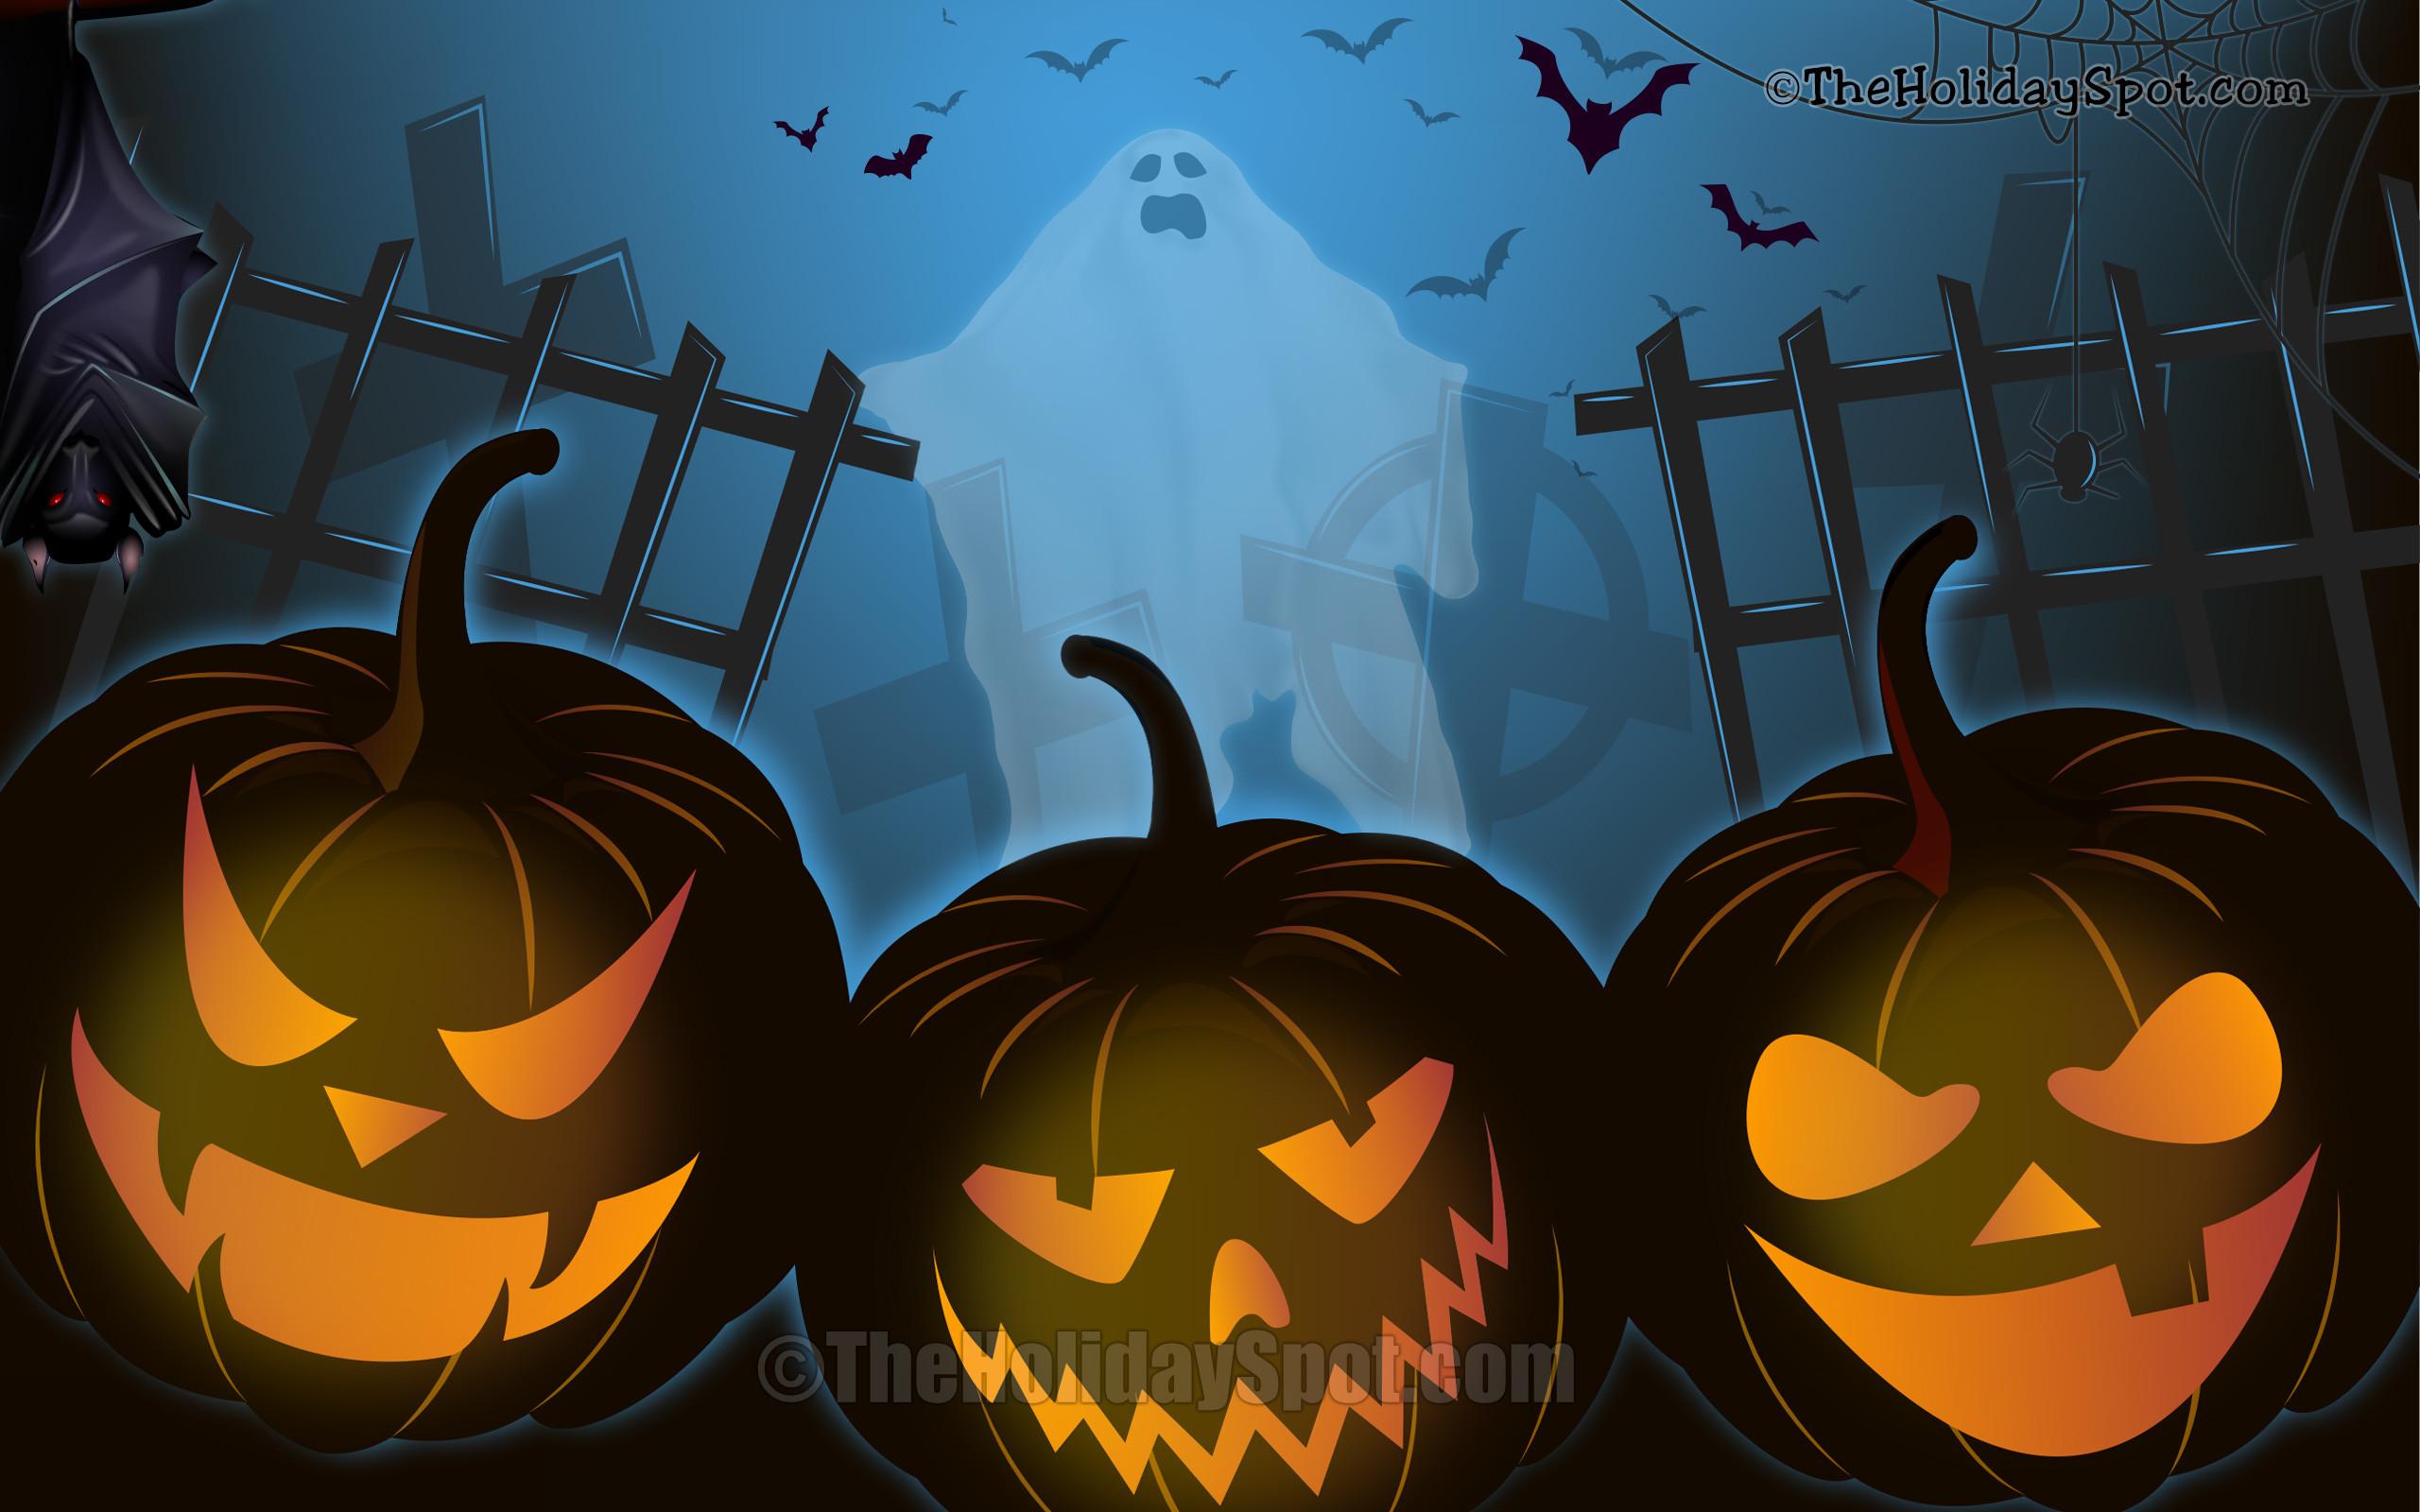 1920×1200 px; Live Halloween Wallpaper